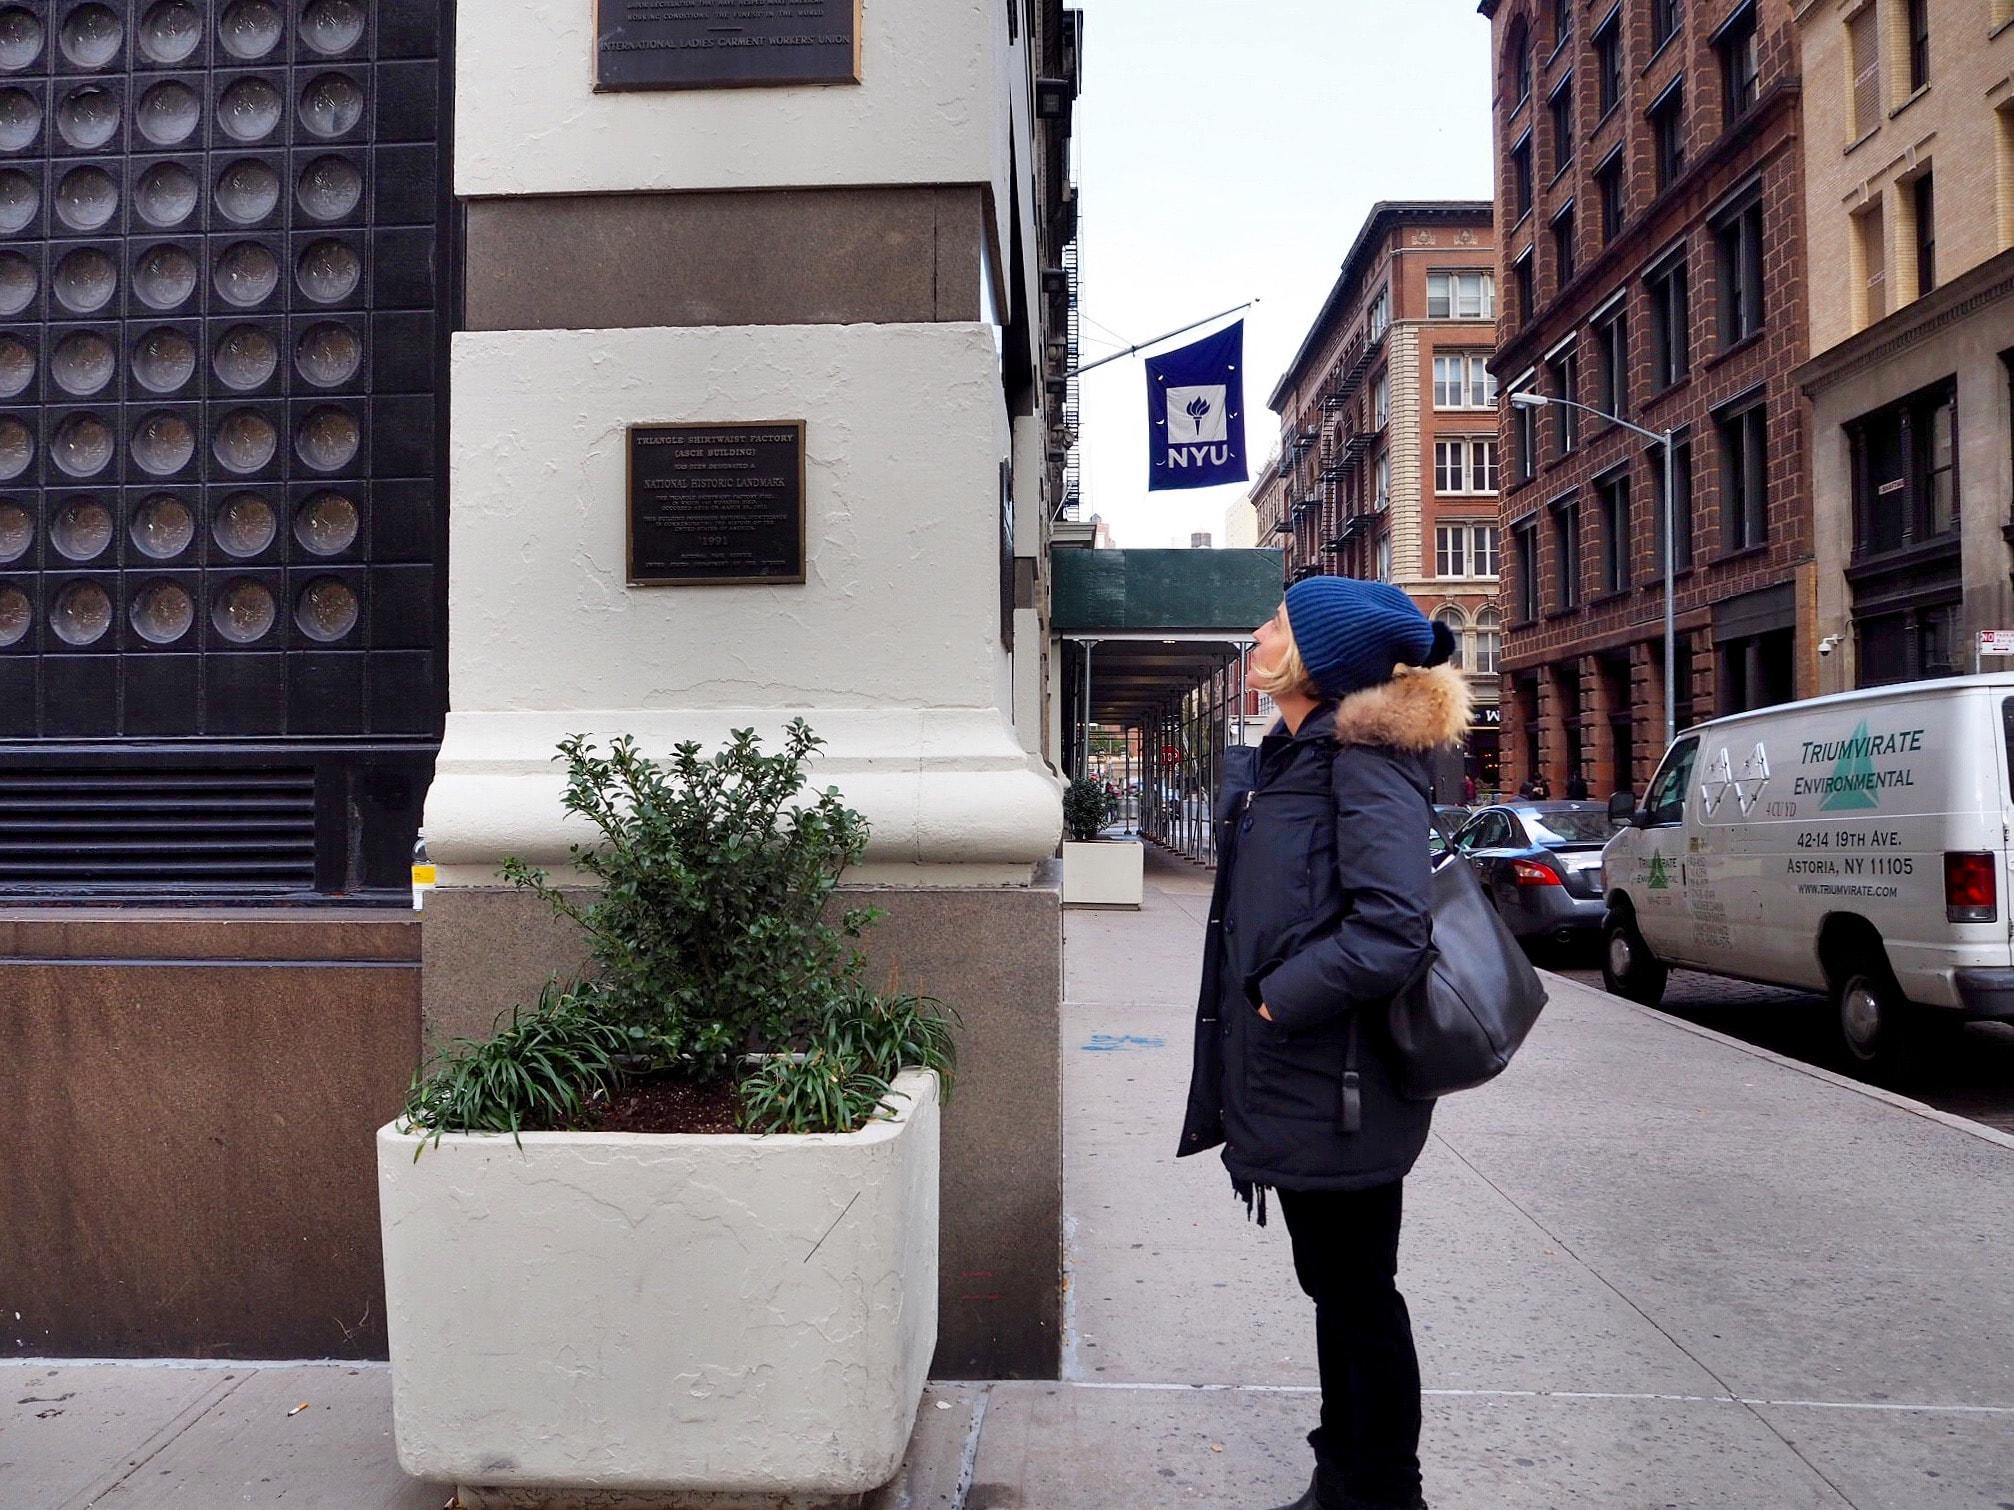 NYU's Brown Building | © Culture Trip / Nikki Vargas